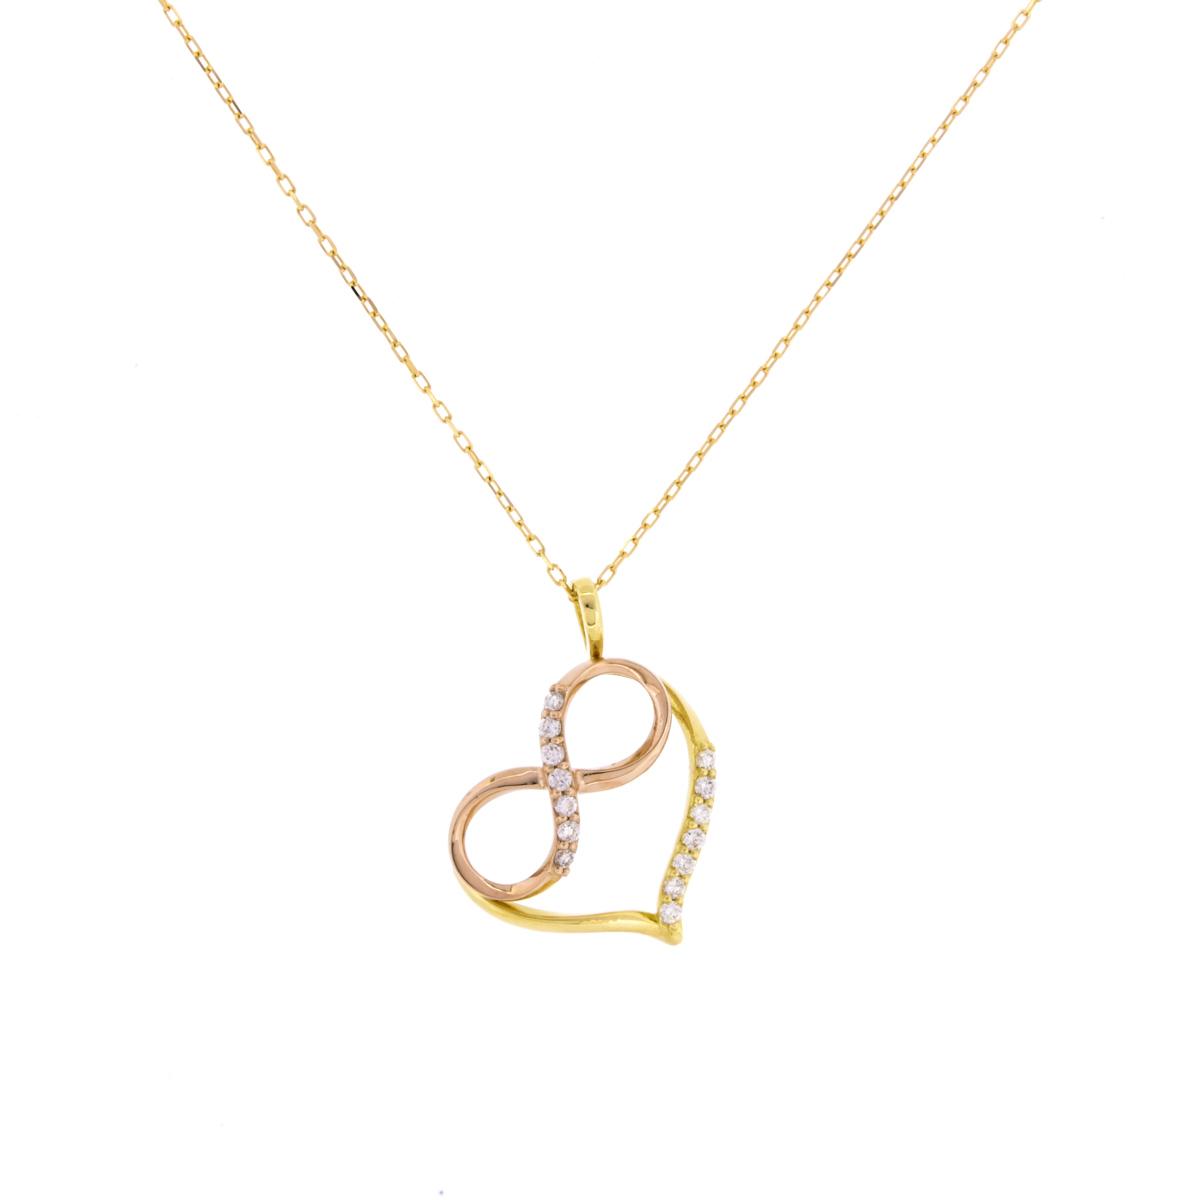 K18YG K18PG ダイヤモンド ペンダント ネックレス インフィニティハート